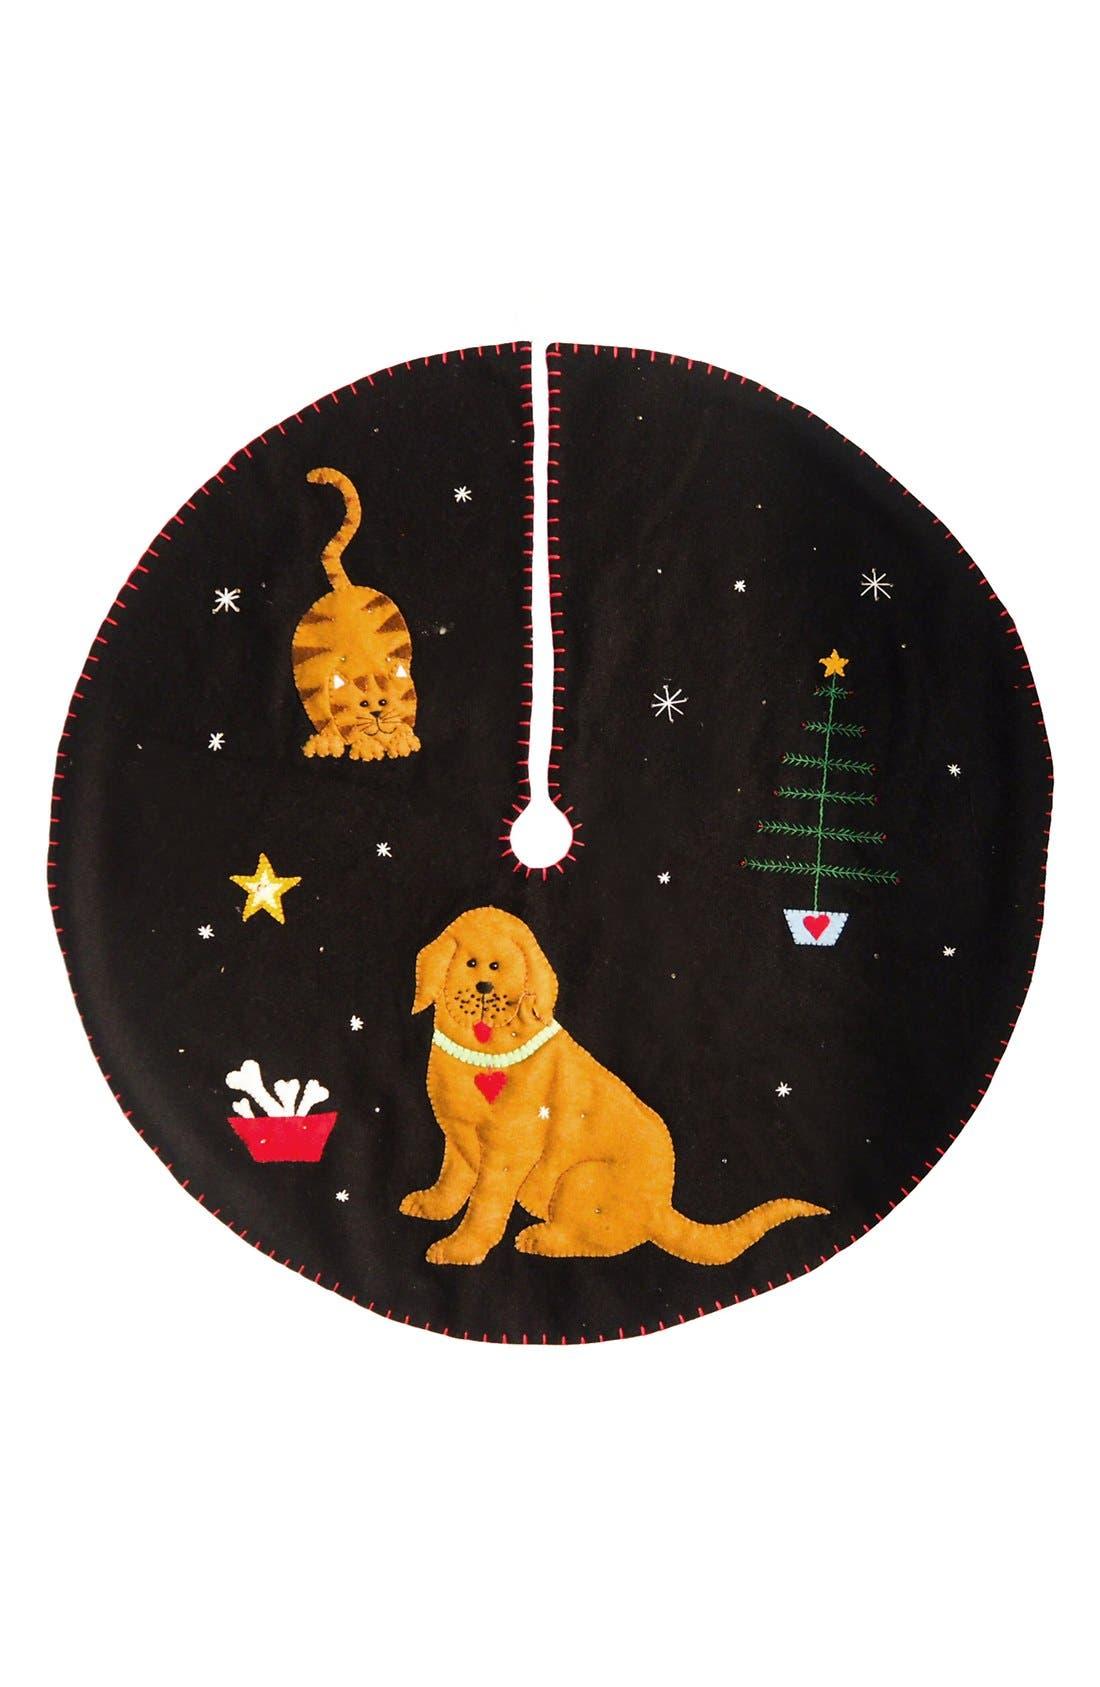 NEW WORLD ARTS Dog & Cat Tree Skirt, Main, color, 001